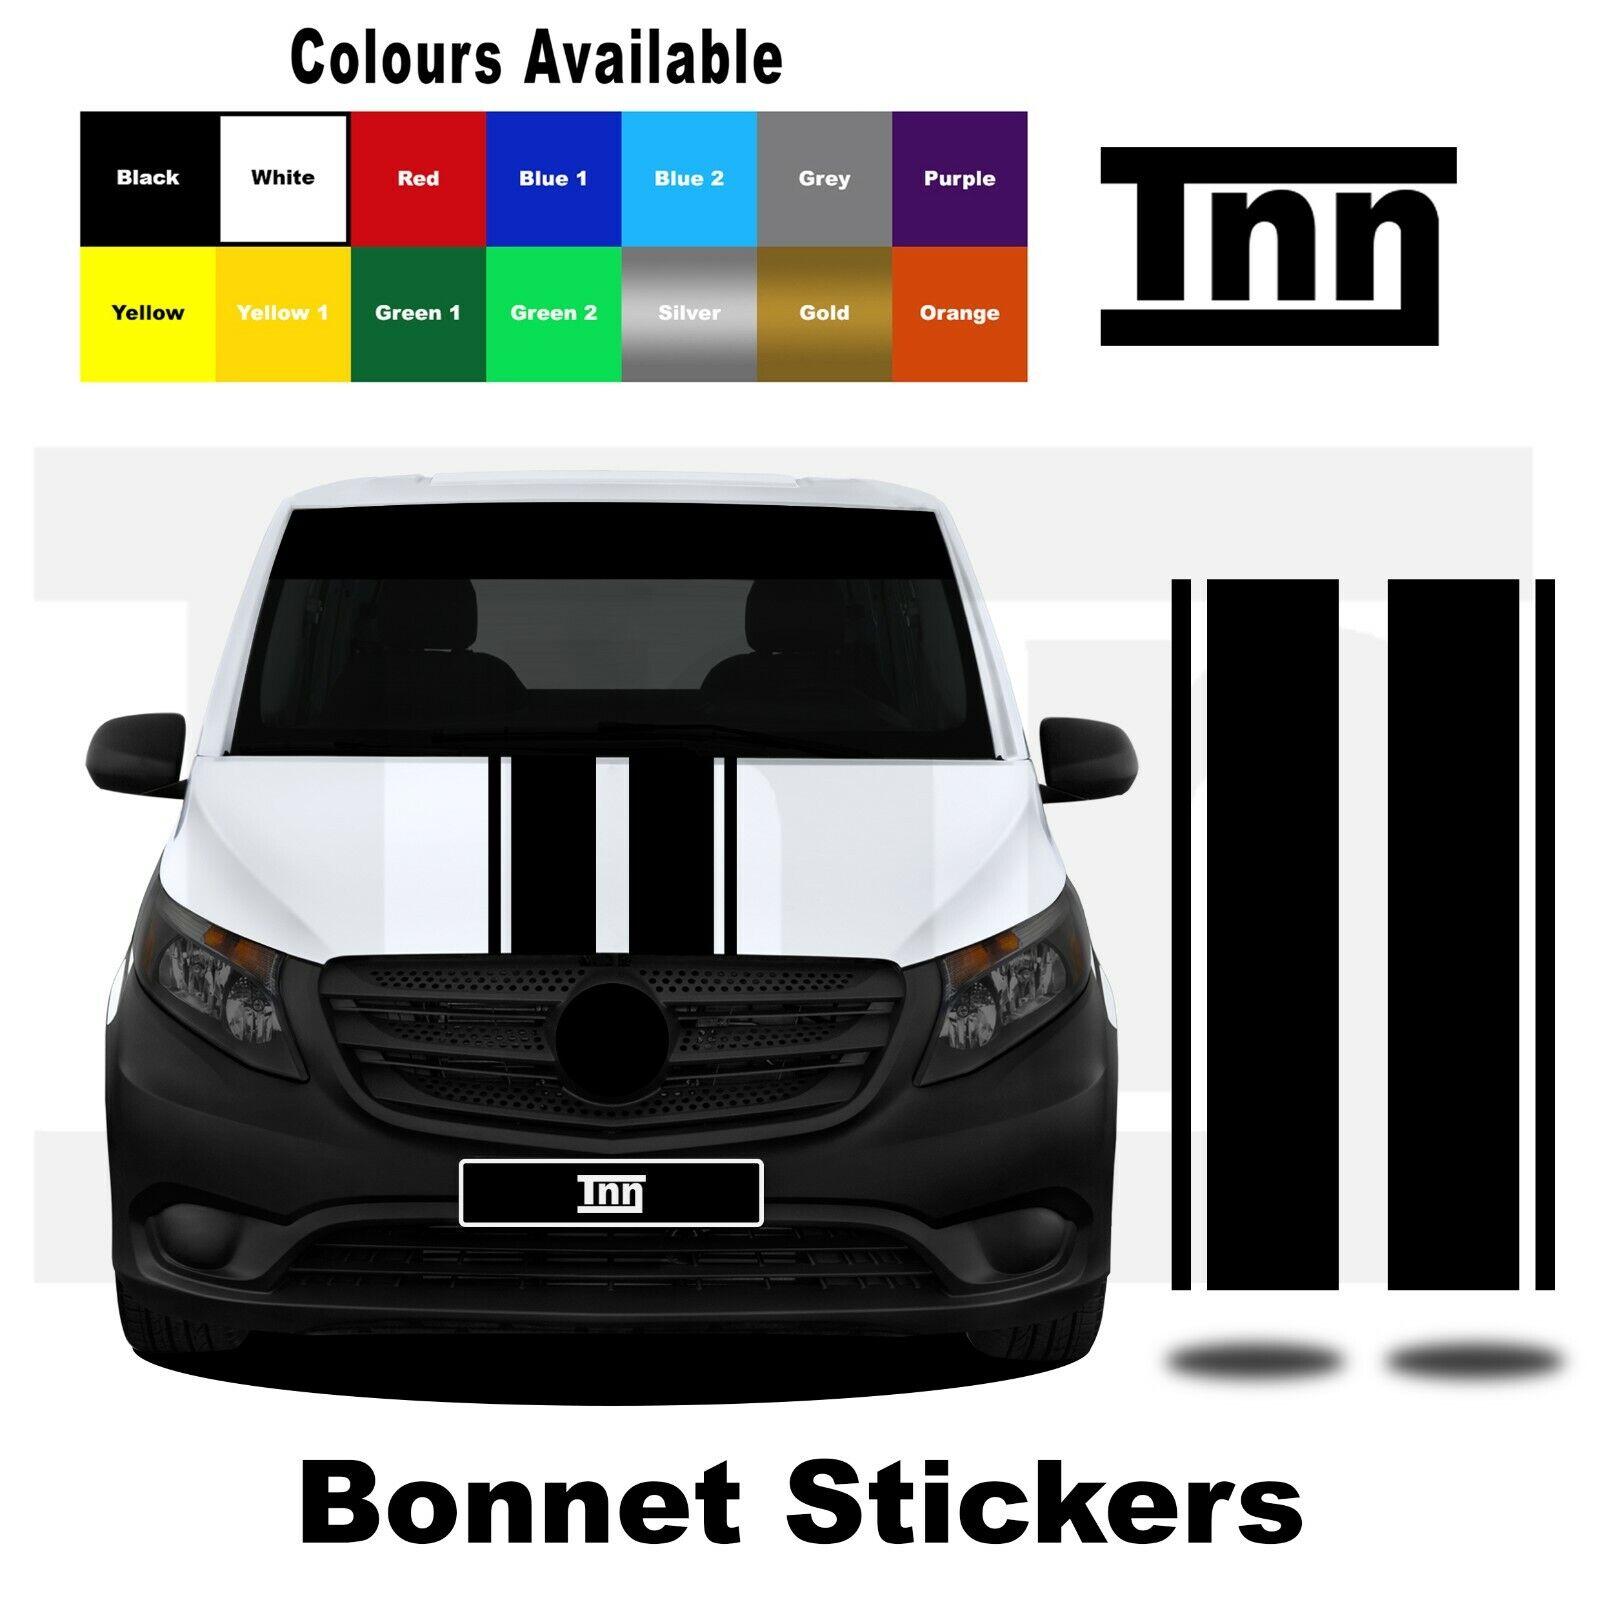 Fits Vauxhal Car Bonnet Stripes Car Stickers Car Decal Racing Stripes,Stickers